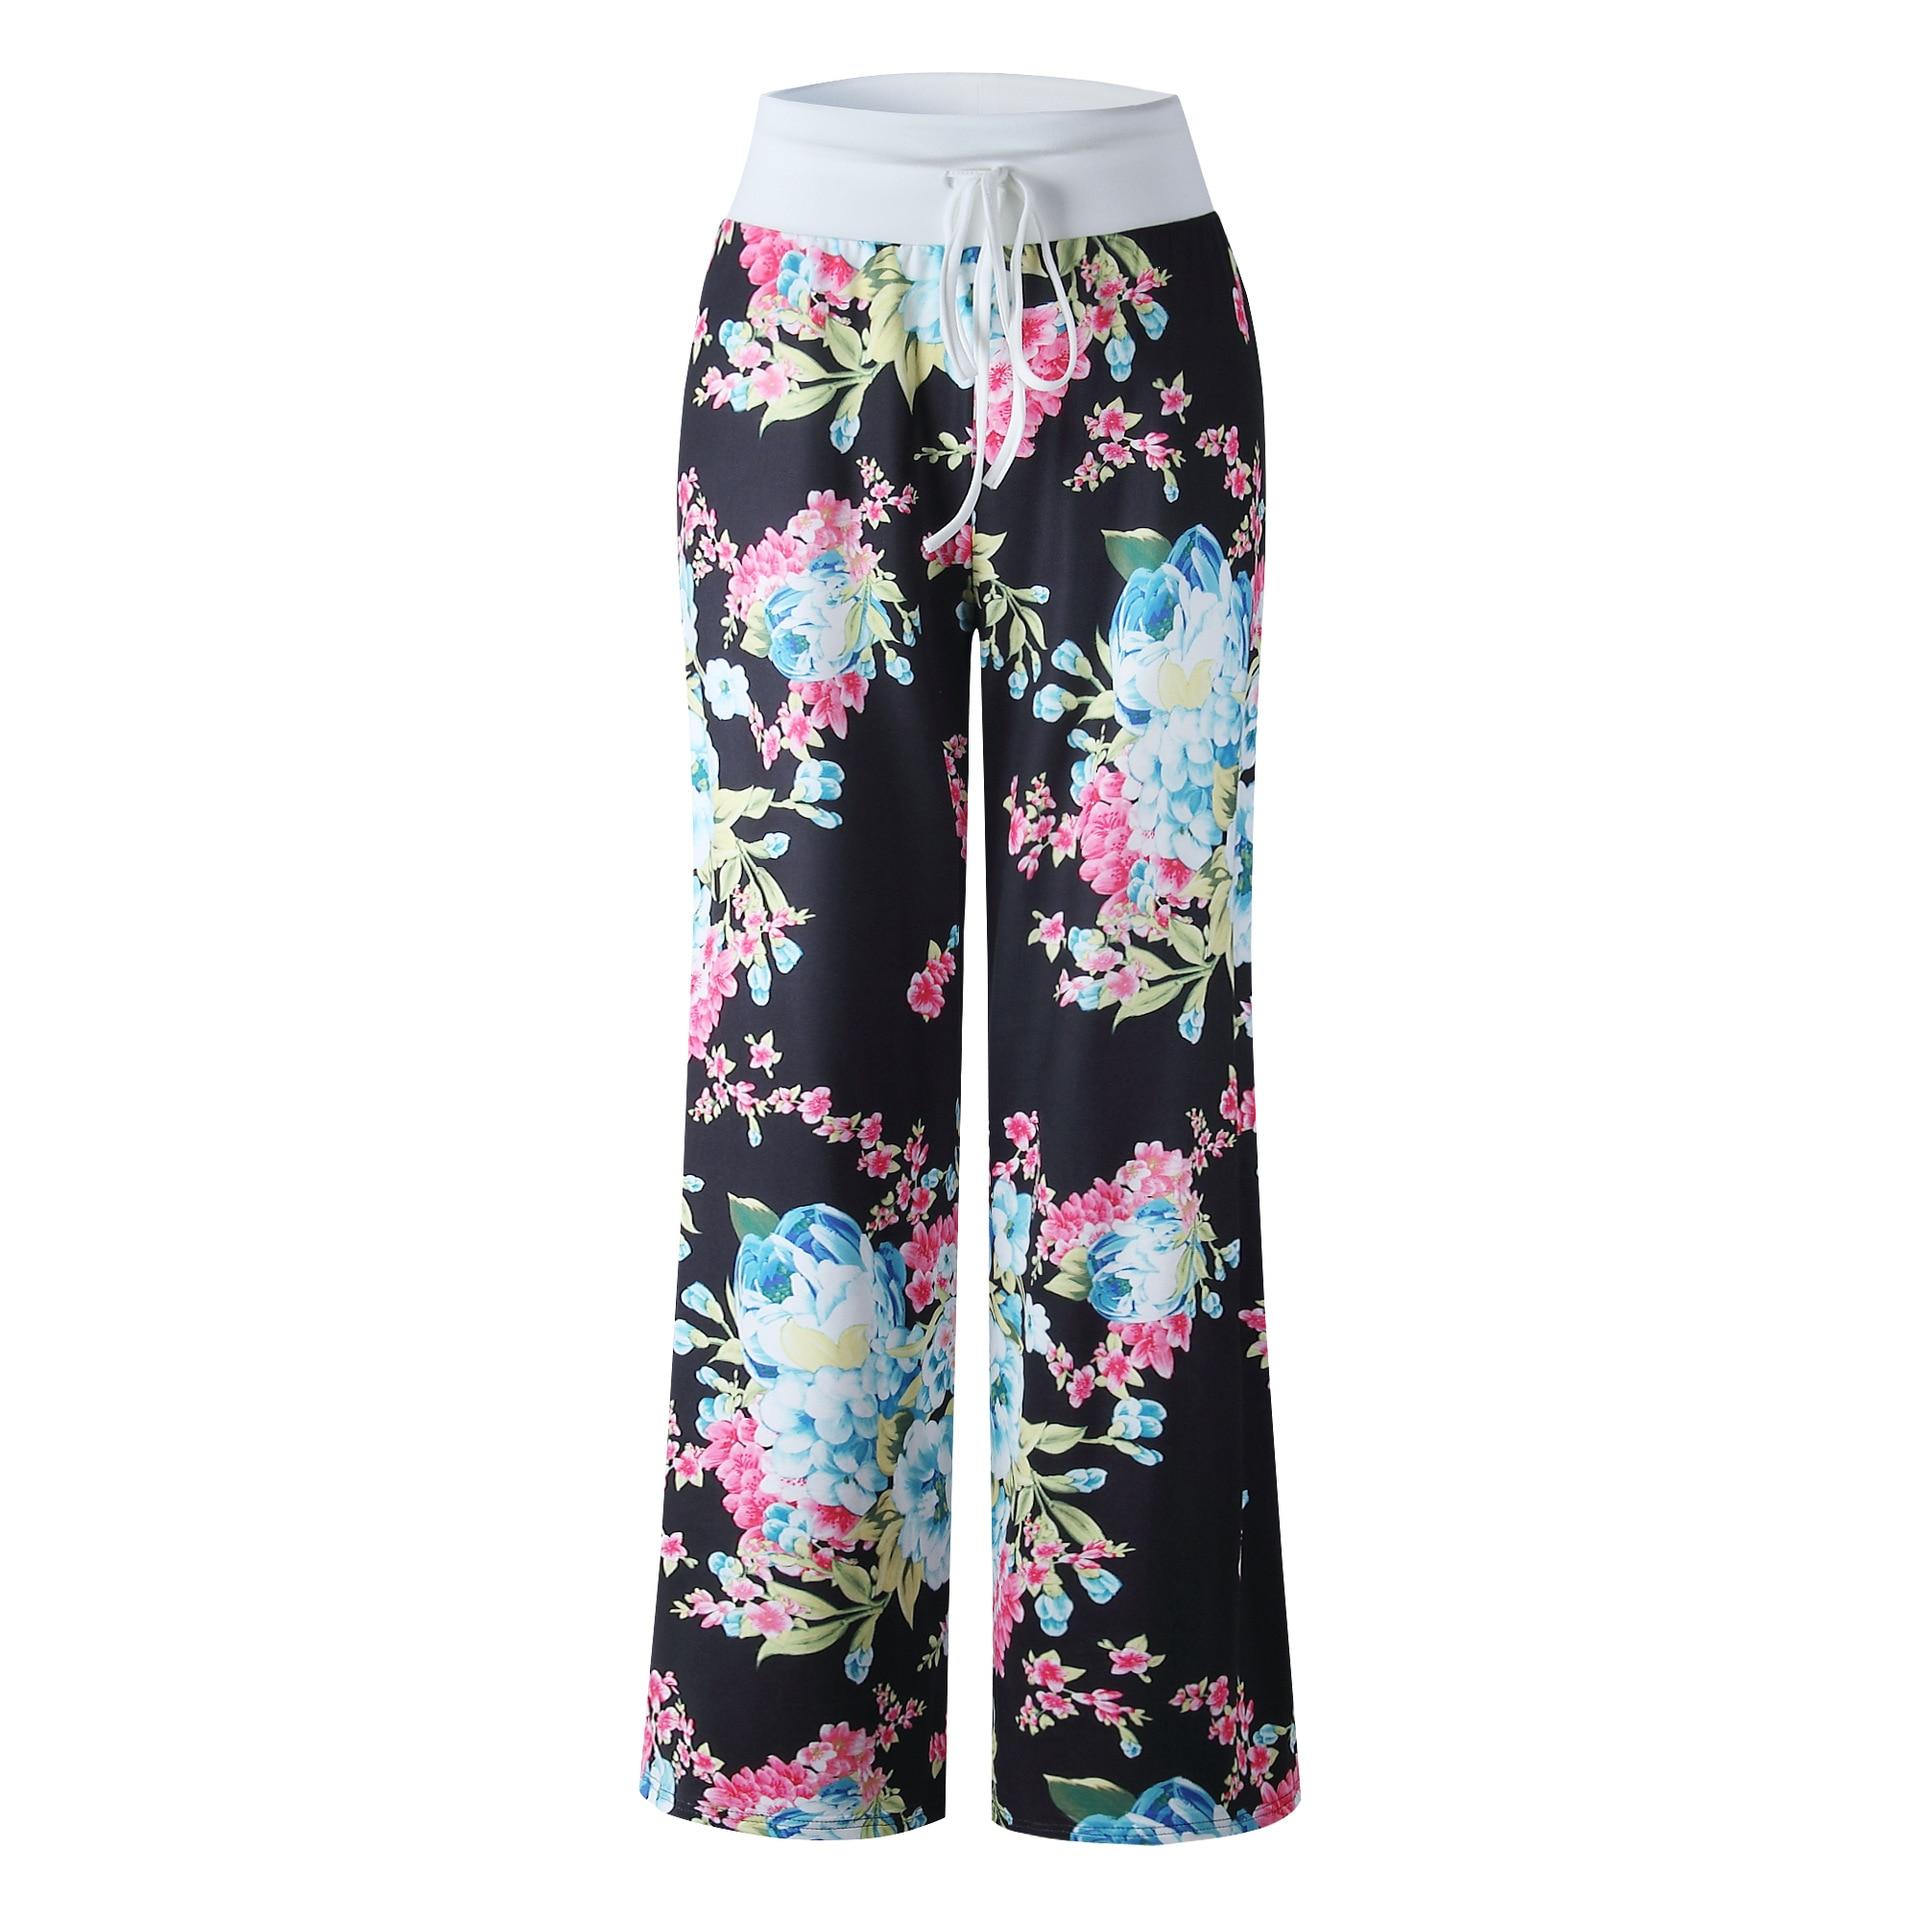 Women Long Pants Loose Floral Print Drawstring Lace Camouflage stripe Wave point Sweatpants 17